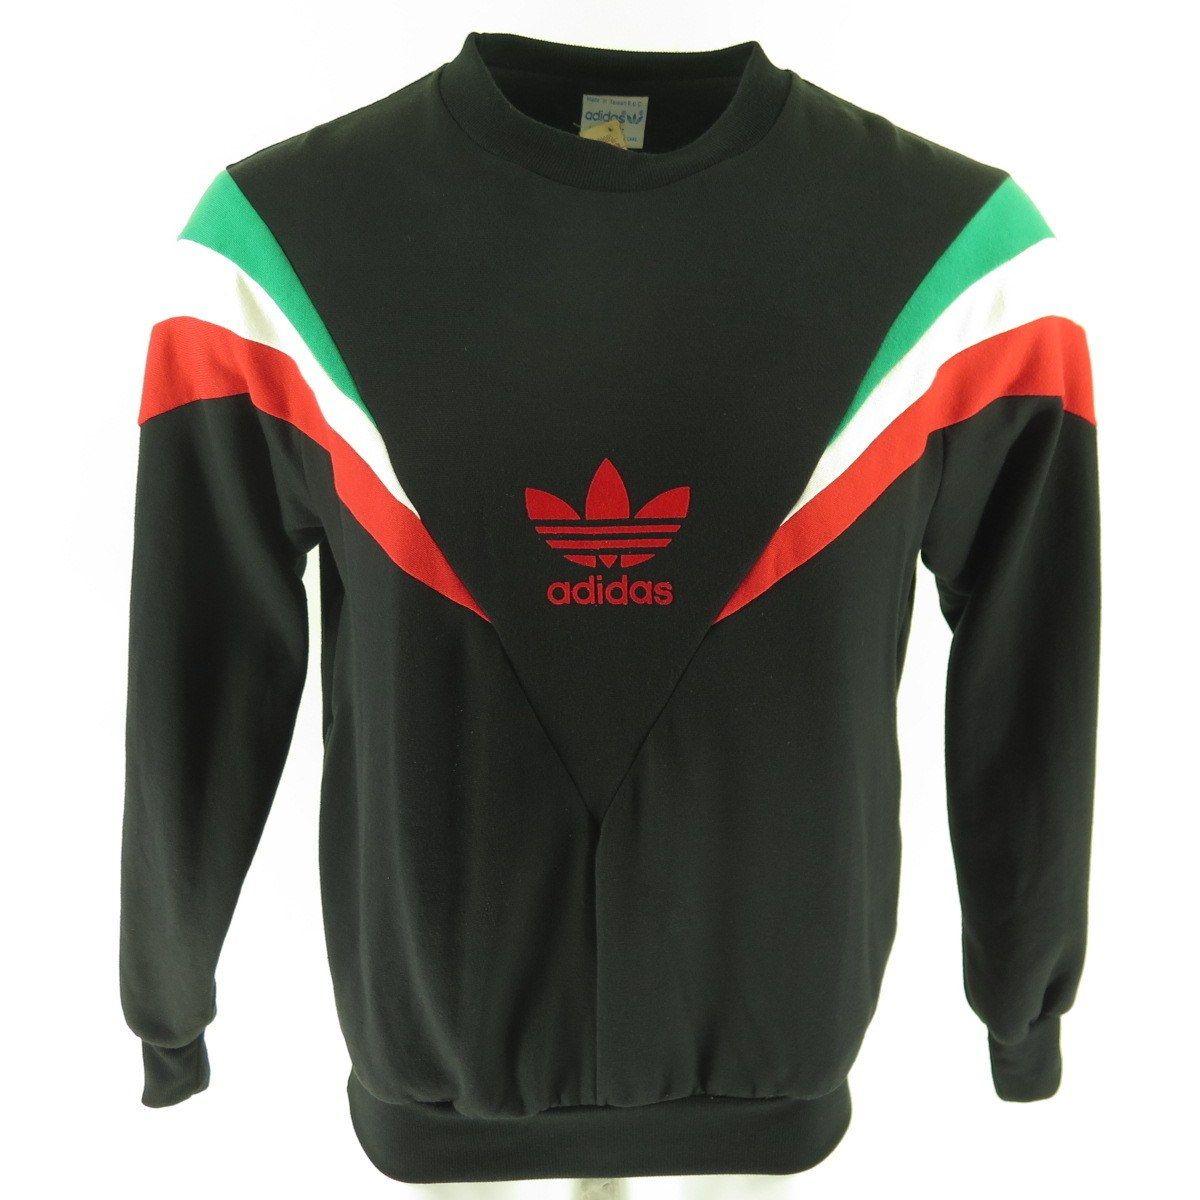 e64aec4e0bceb Vintage 80s Adidas Trefoil Sweatshirt Mens L Deadstock Flock Print ...